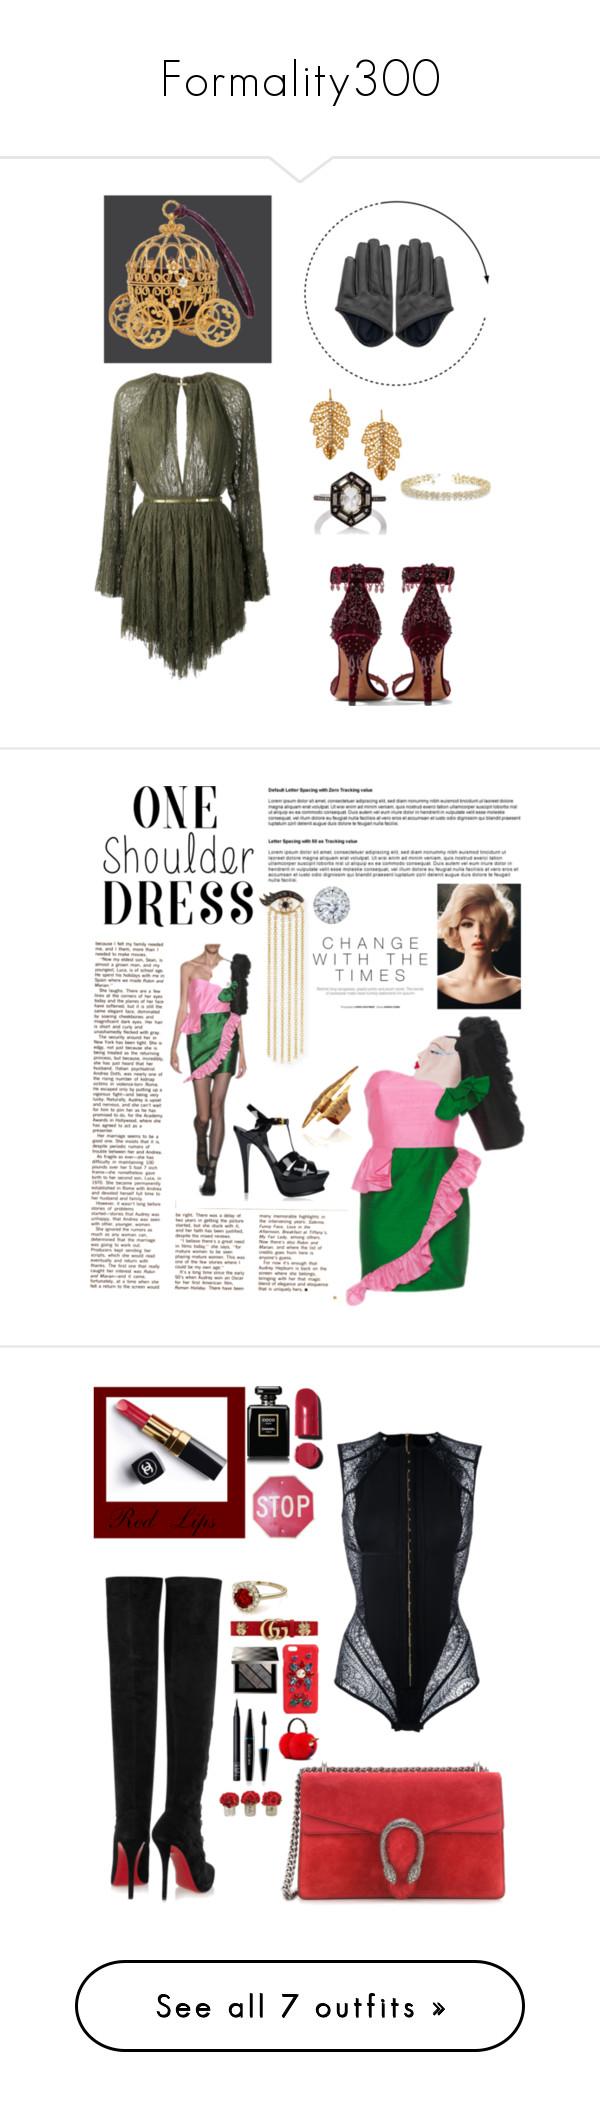 """Formality300"" by liajkou ❤ liked on Polyvore featuring Jay Ahr, Givenchy, Marika, Cathy Waterman, Allurez, VIVETTA, Yves Saint Laurent, Sydney Evan, Kobelli and contest"